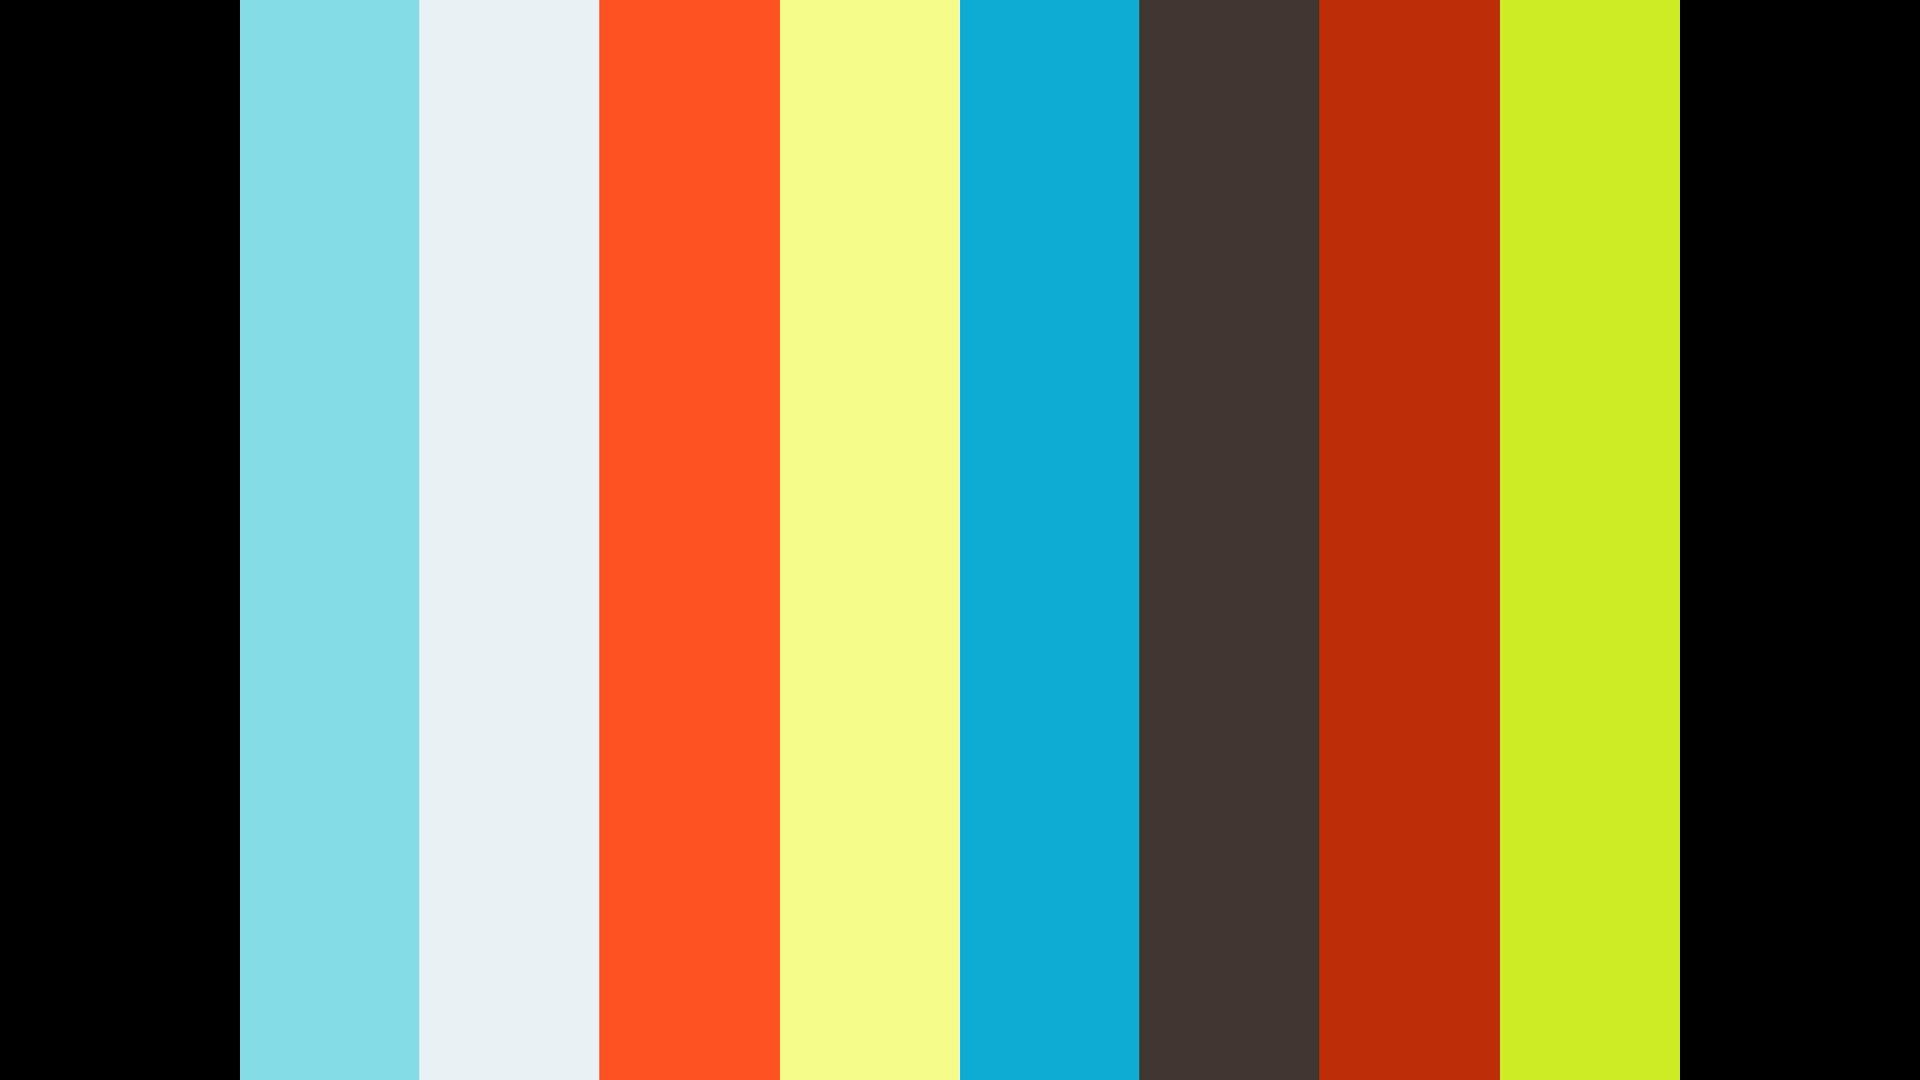 Ethiopianism.tv # Debate & Analysis ንትርክና ግምገማ 18 July 2018.27